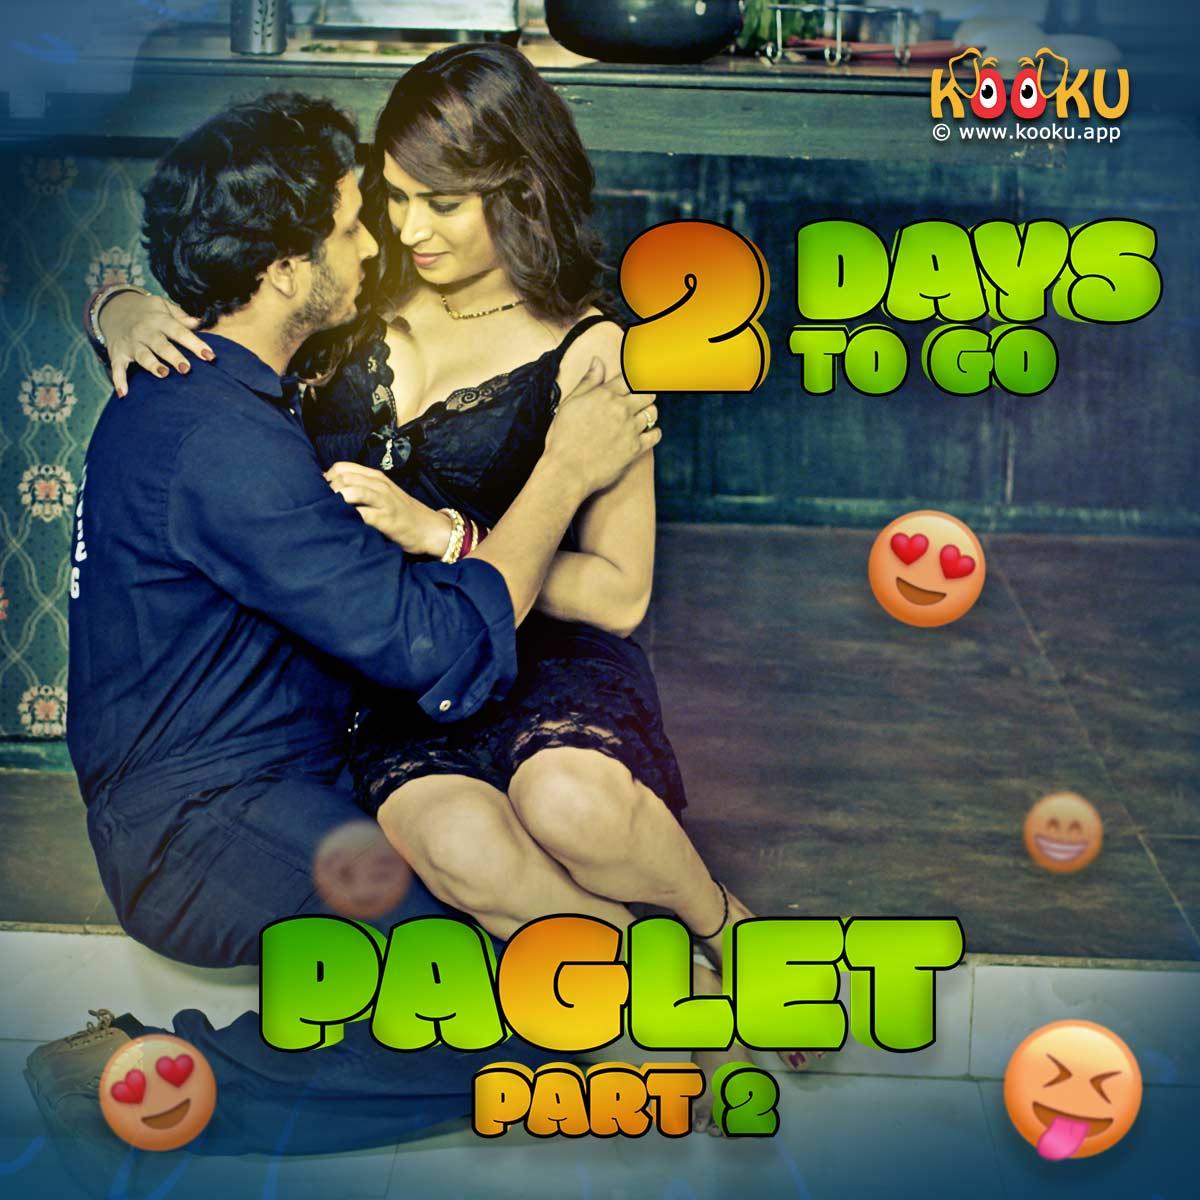 18+ Paglet Part 2 2021 S01 Hindi Complete Kooku App Web Series 720p HDRip 250MB Download